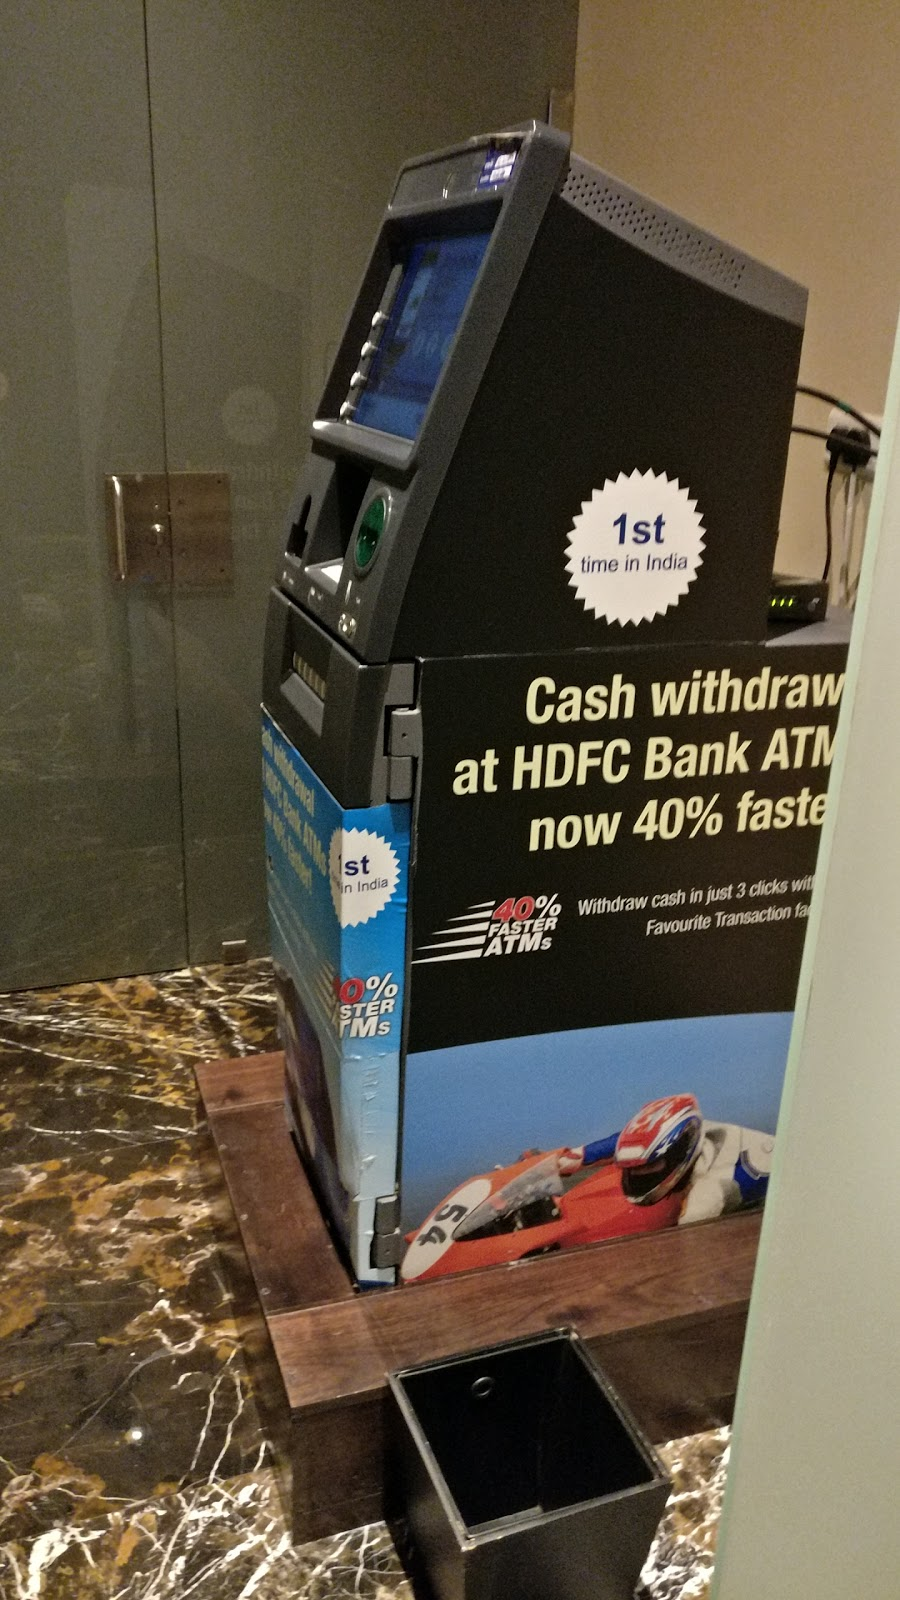 blood bank HDFC Bank ATM near Banjara Hills Telangana